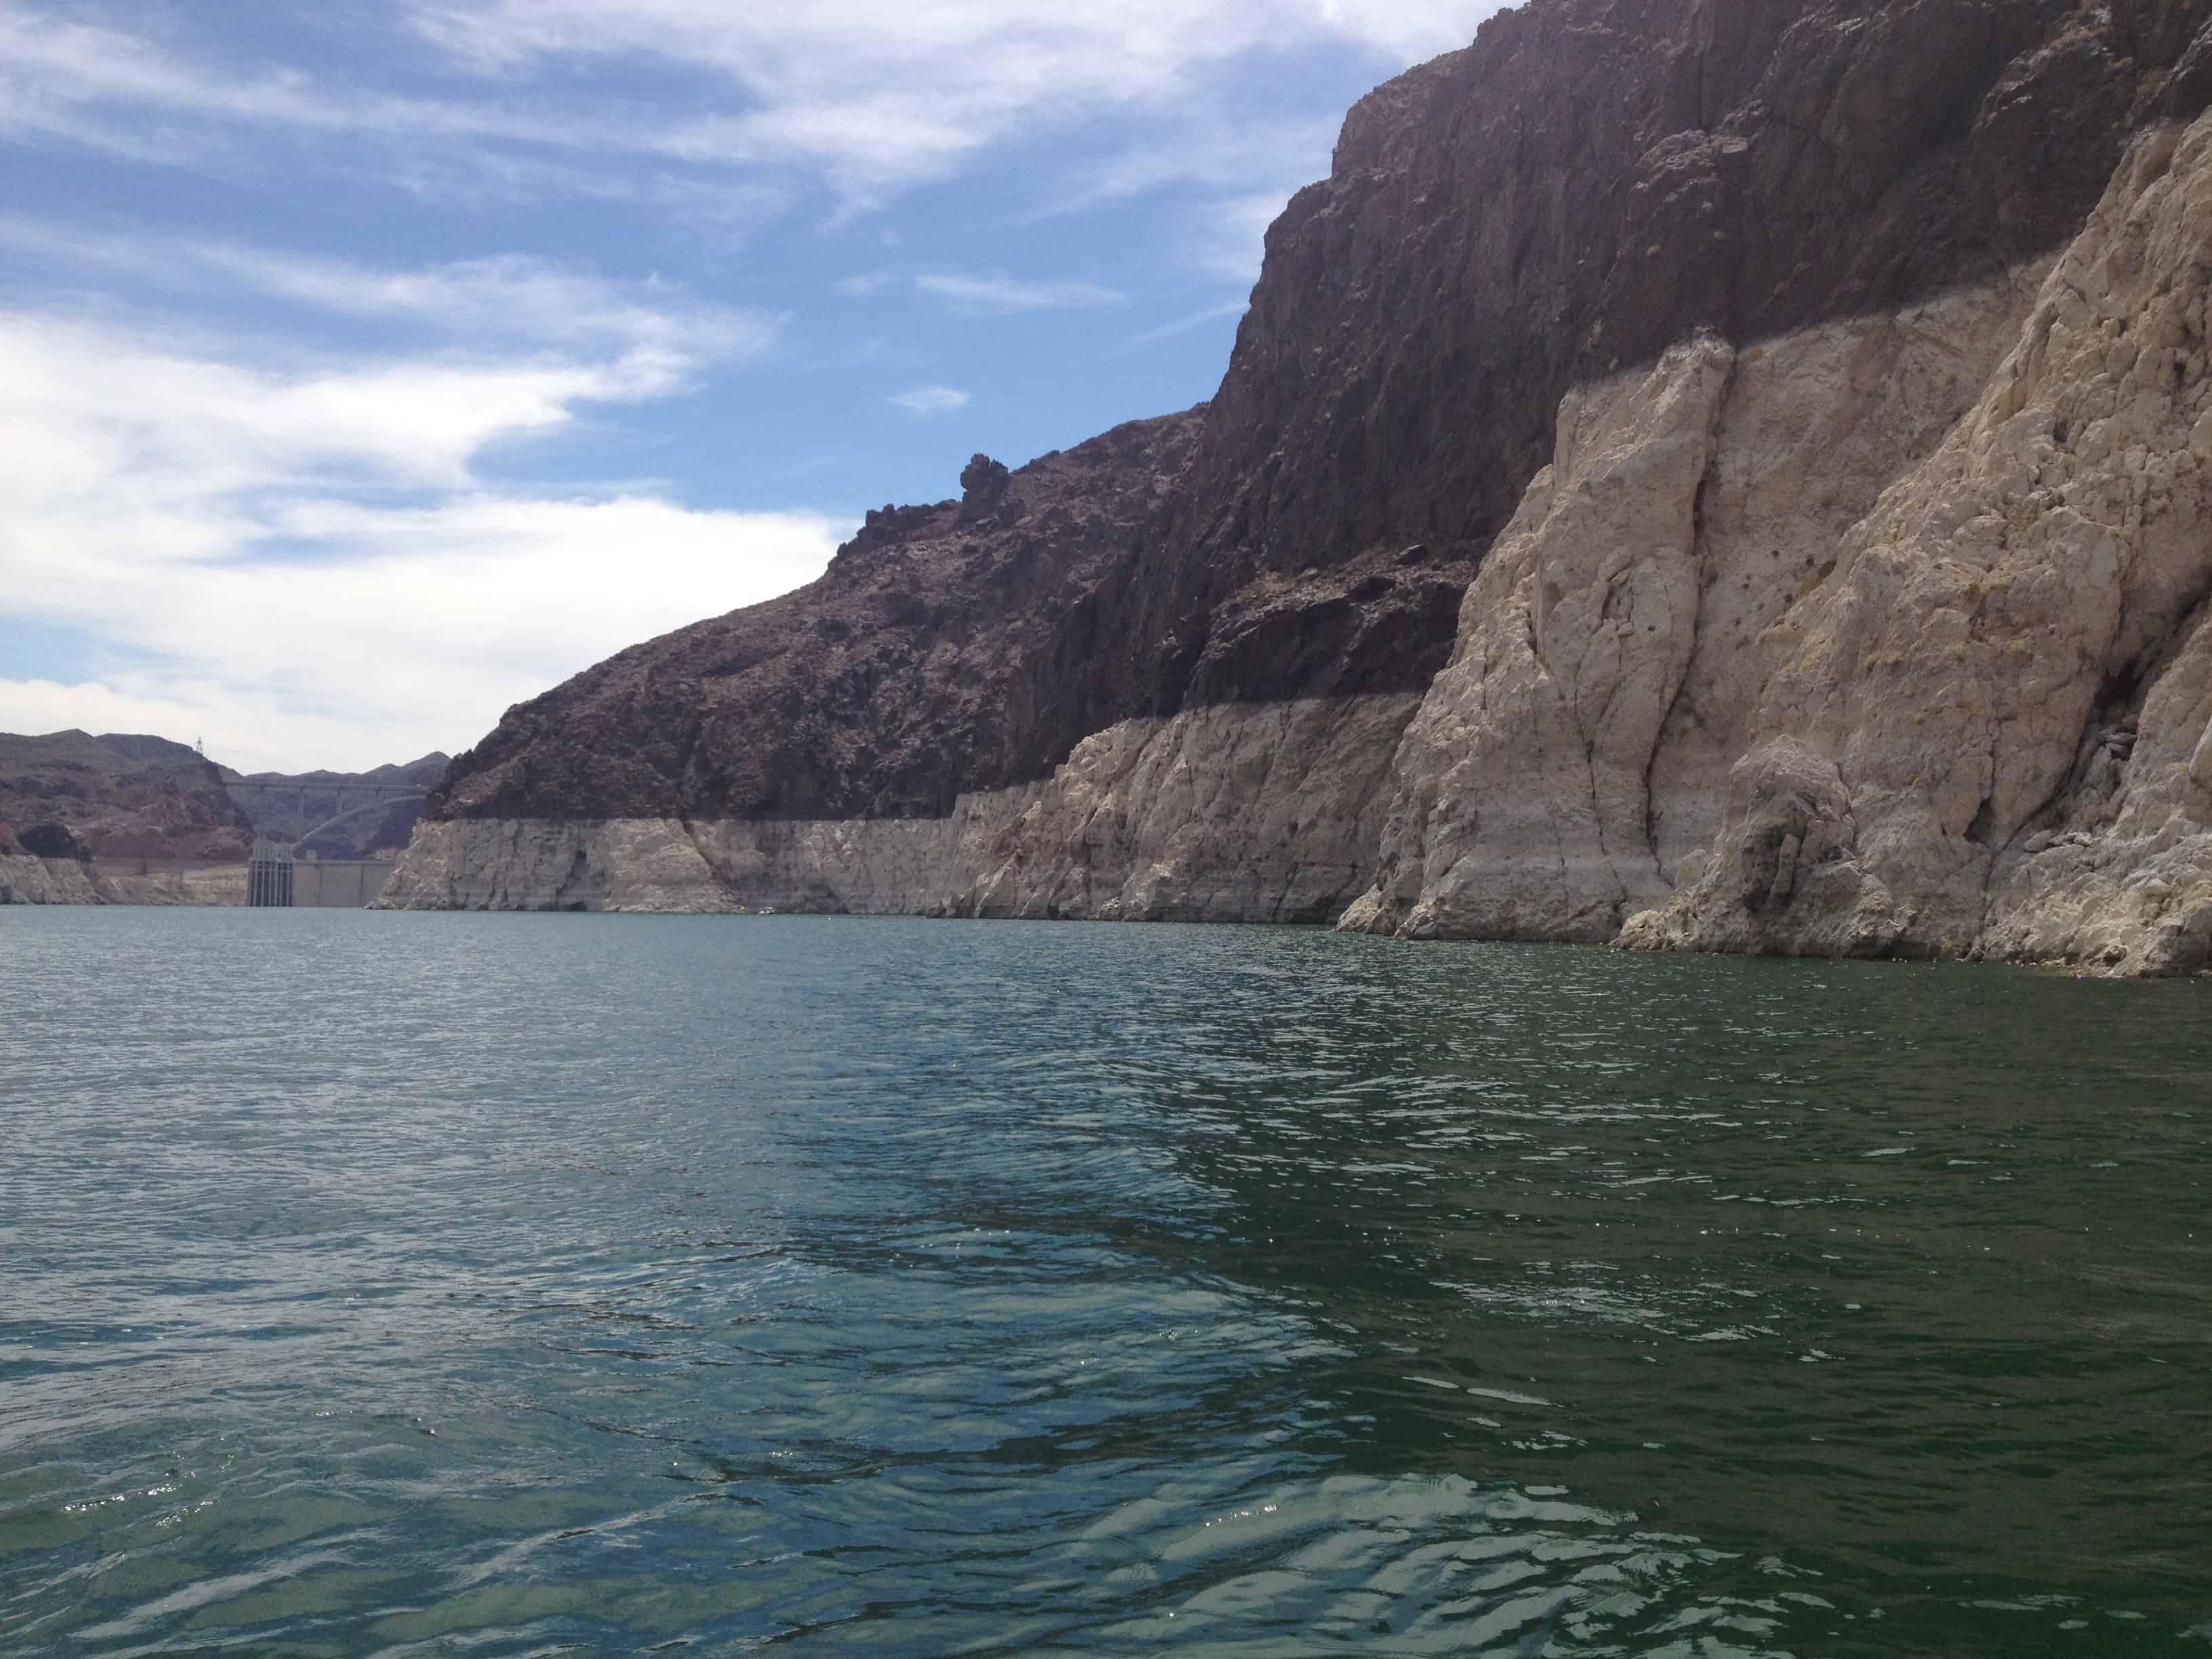 Are Vegas Resorts Draining Lake Mead?